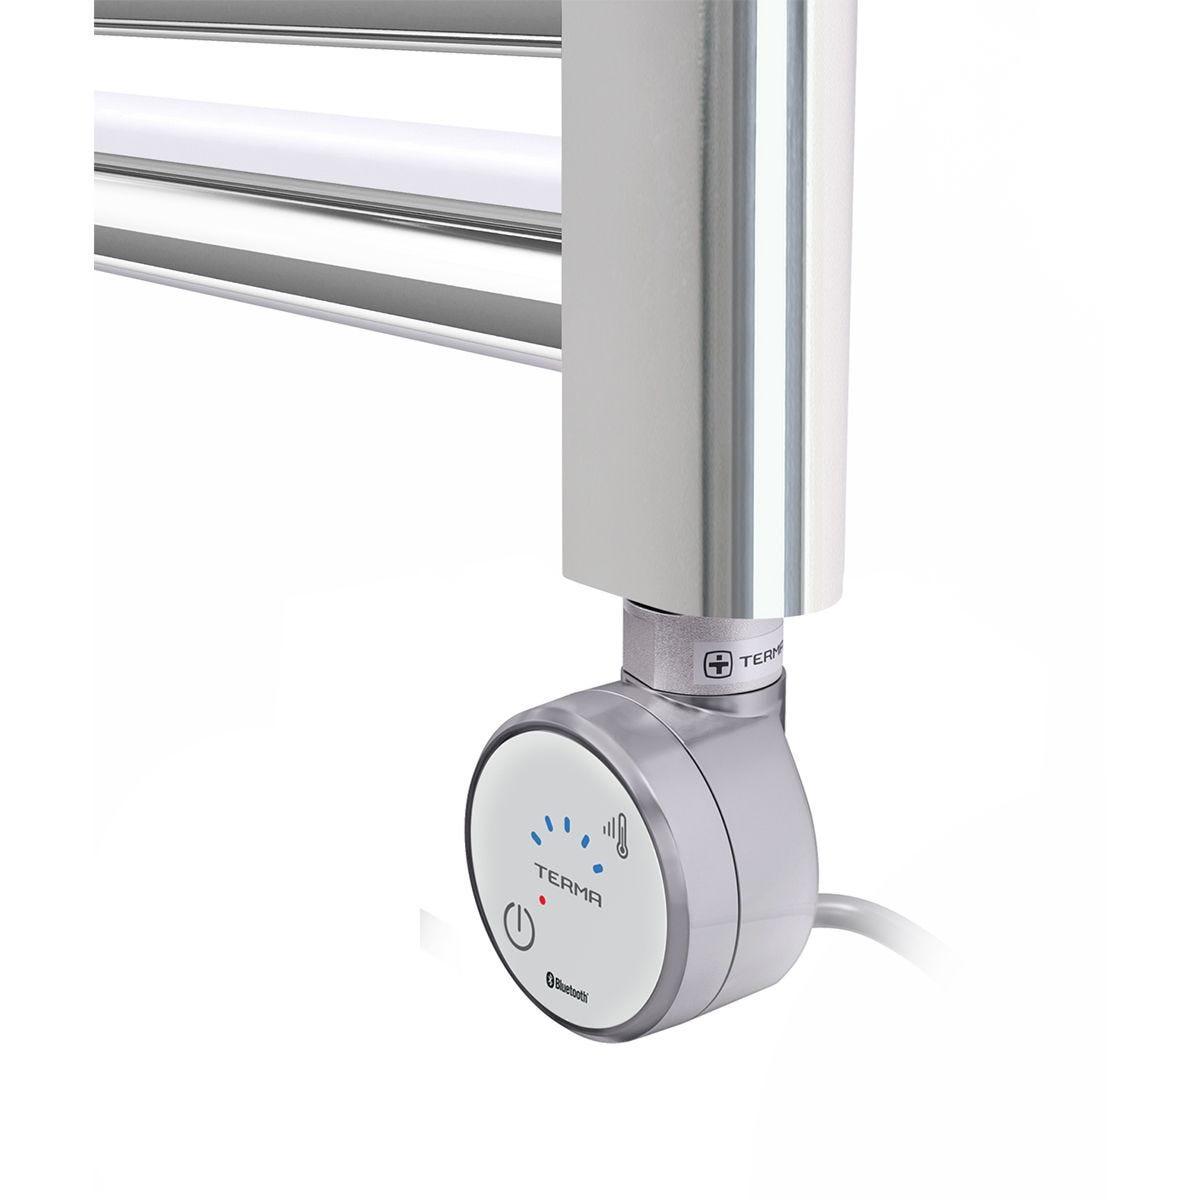 Terma Leo Electric Towel Rail with